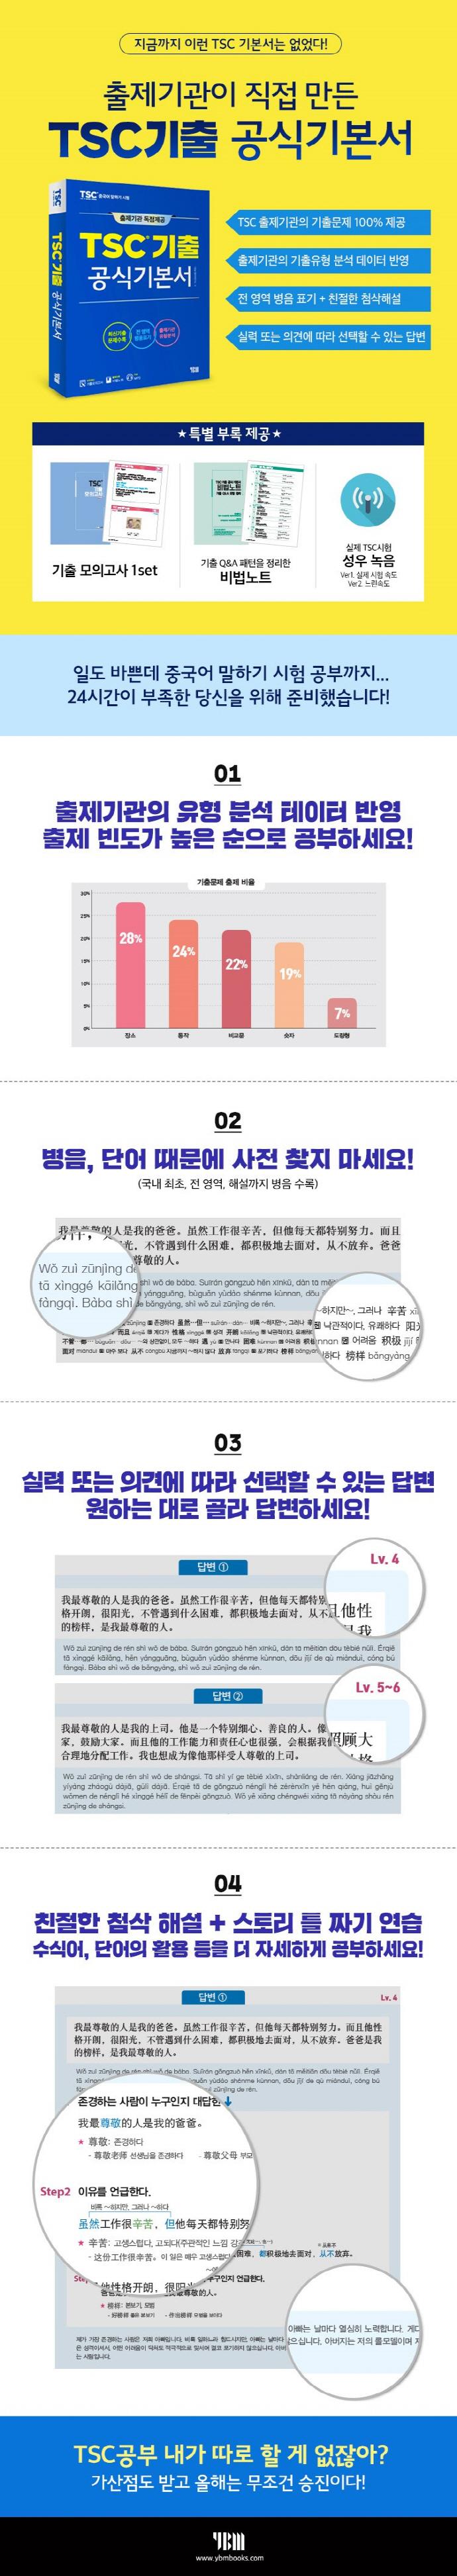 TSC 기출 공식기본서 도서 상세이미지